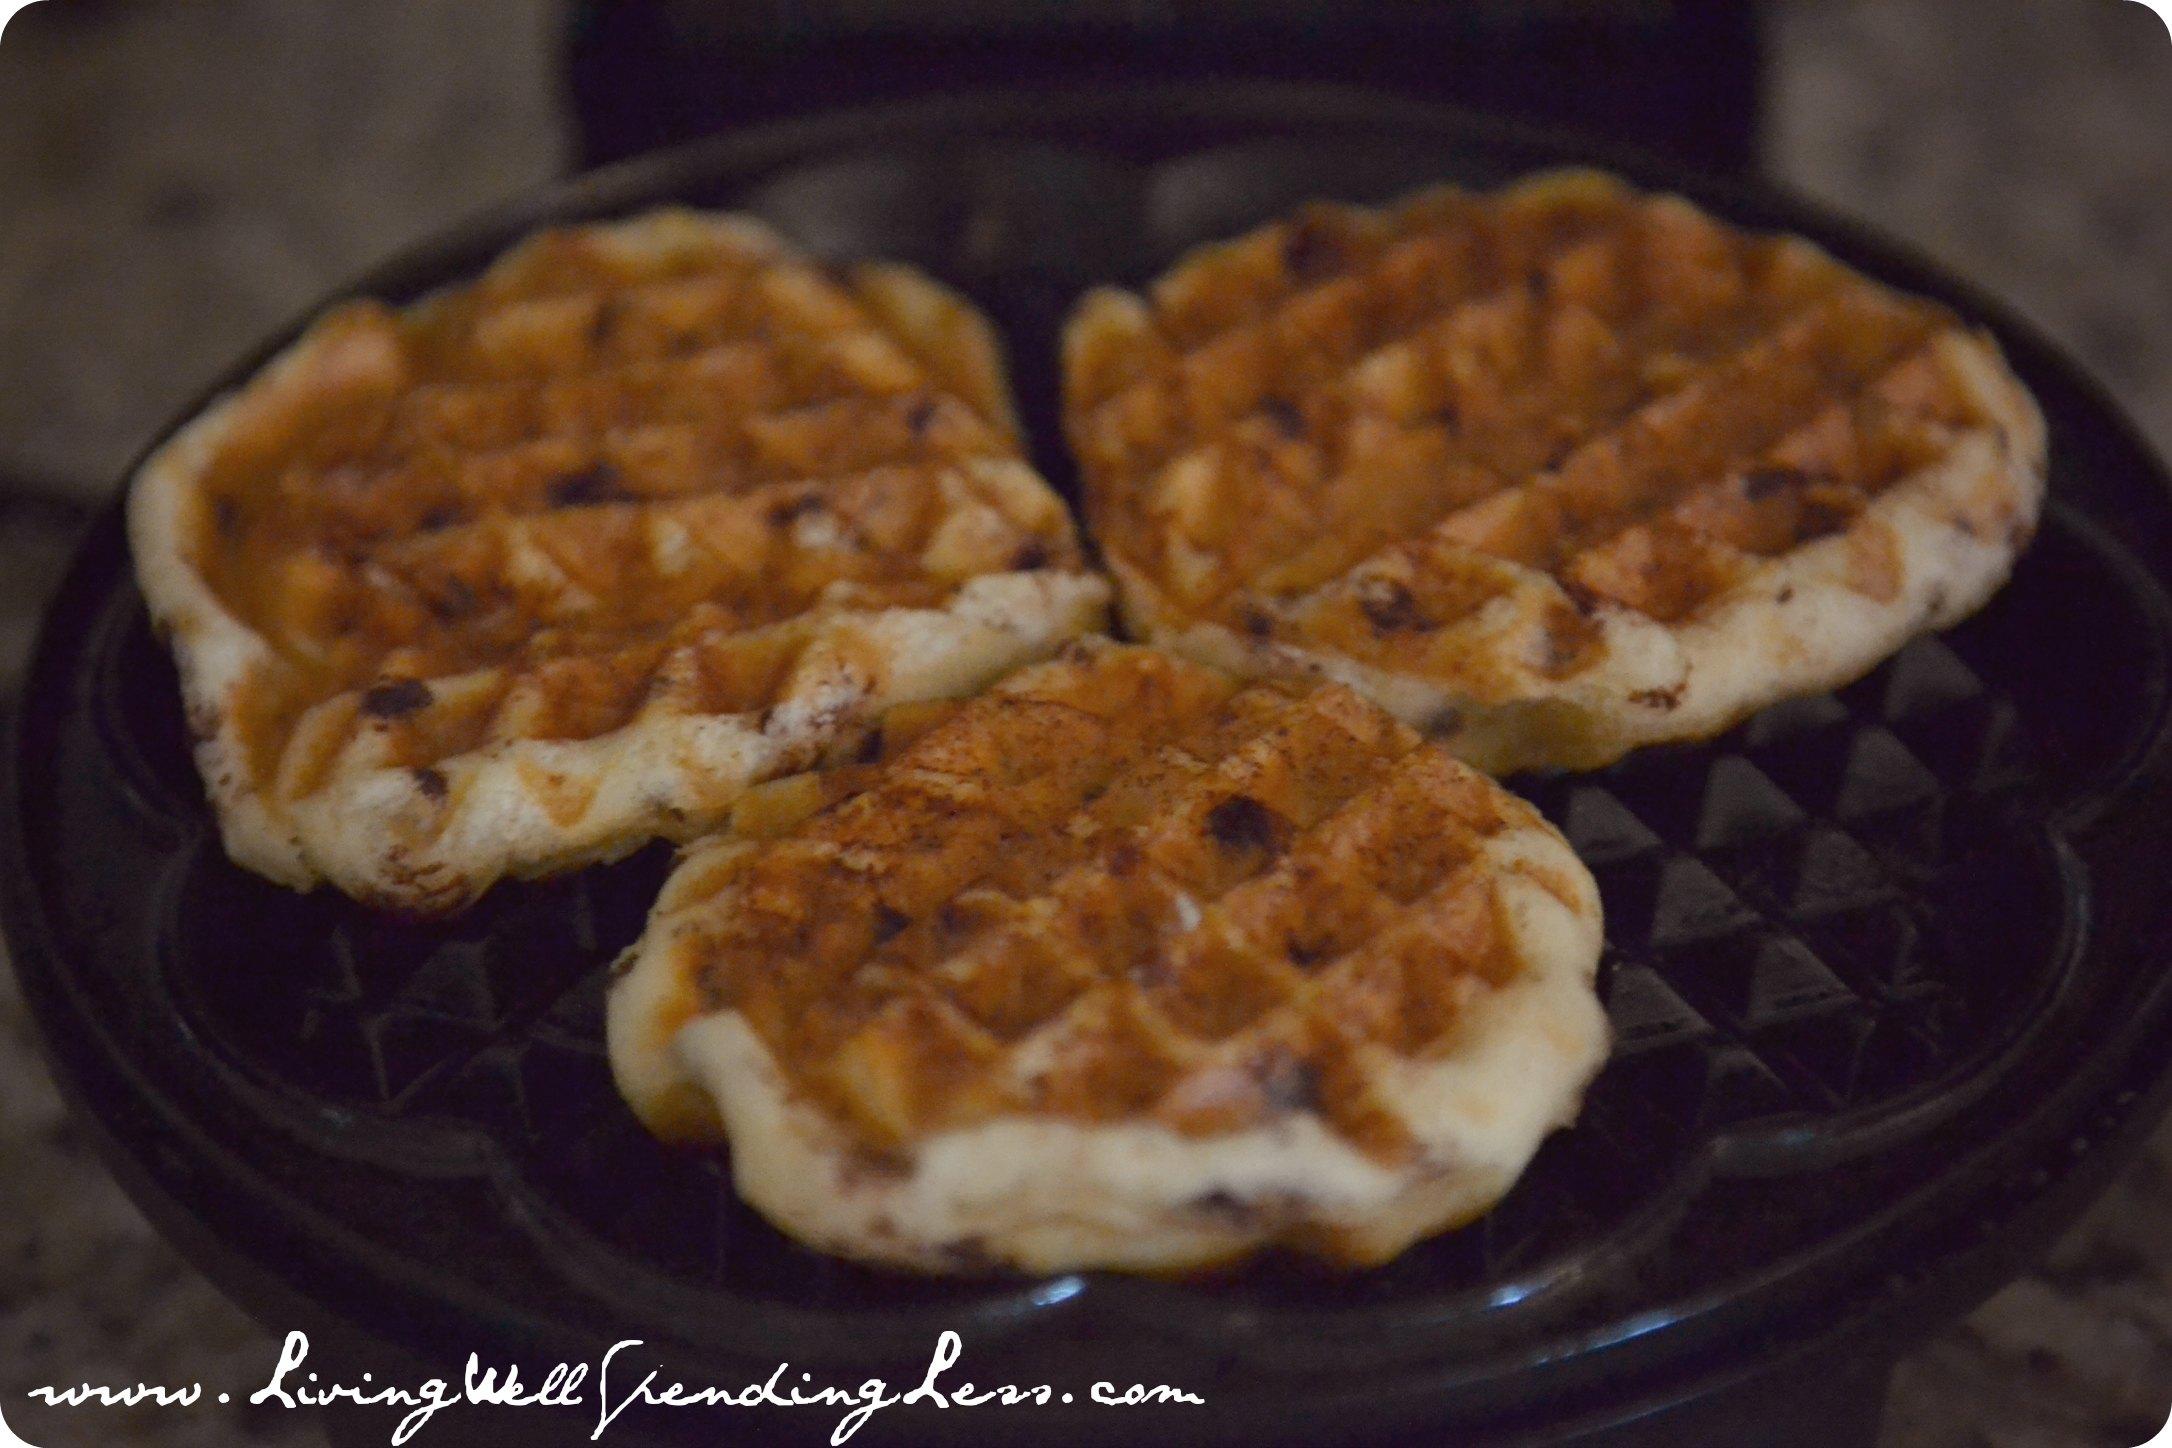 Recipe: Easy Cinnamon Roll Waffles with Creamy Maple Glaze